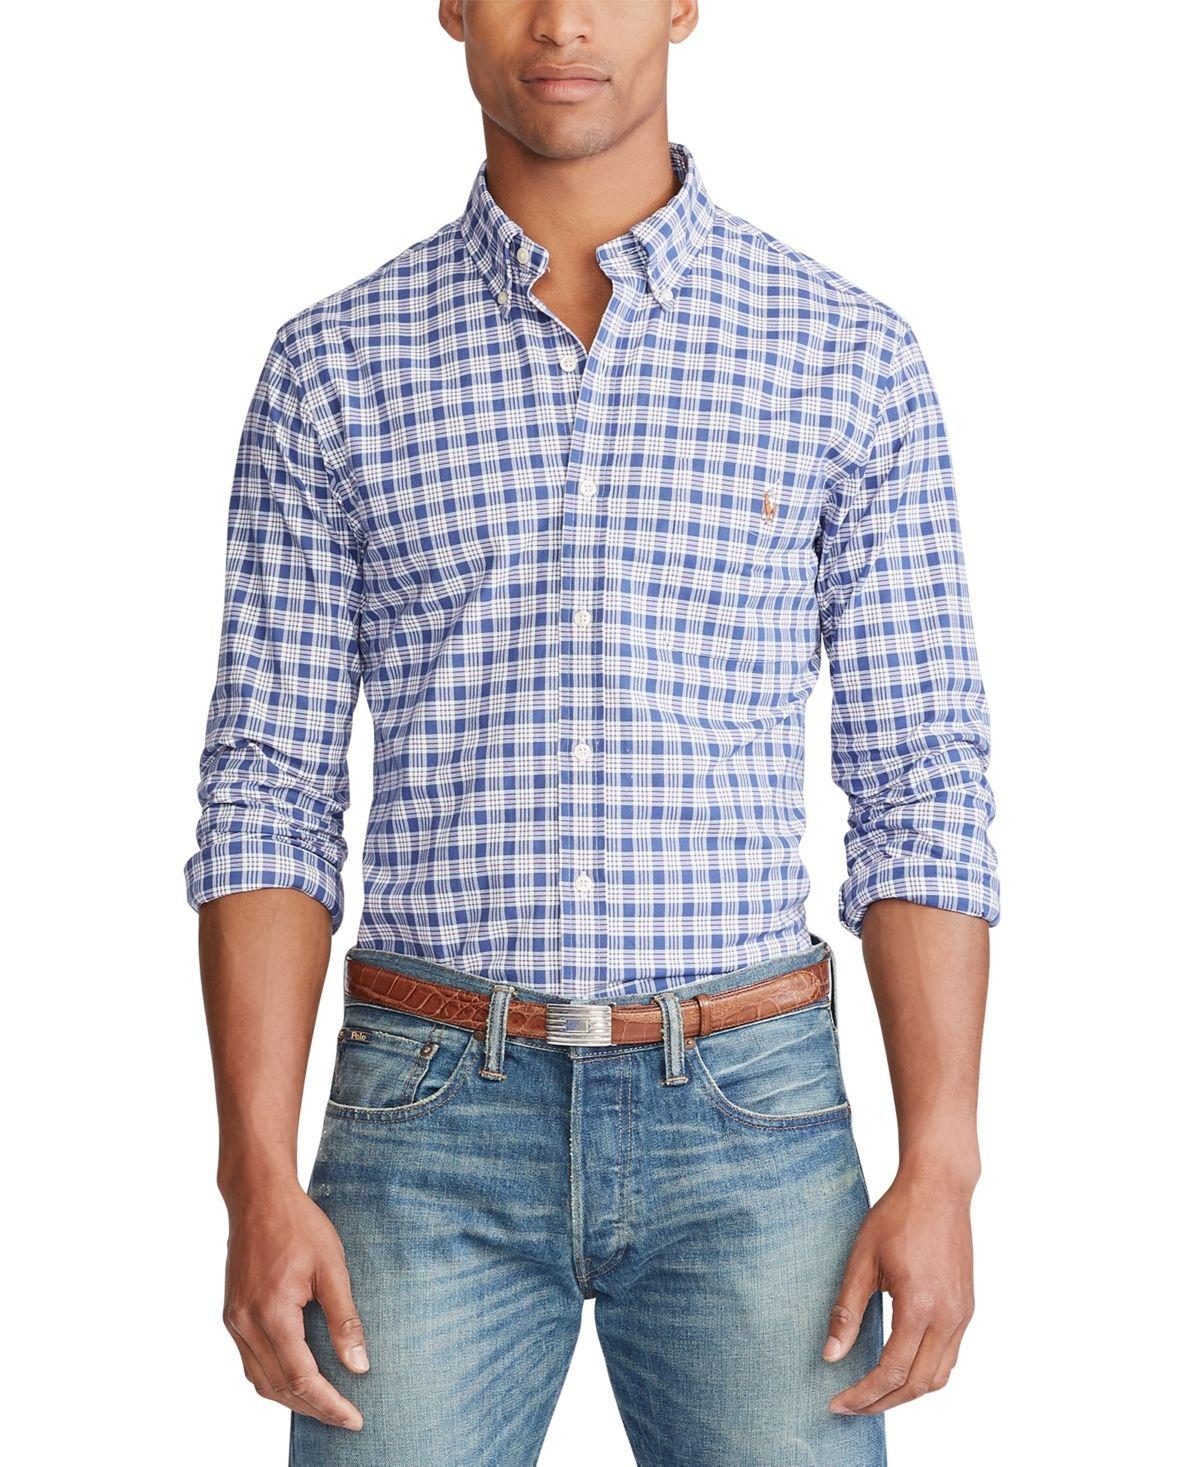 RALPH LAUREN Mens Slim Fit Checkered Casual Shirt